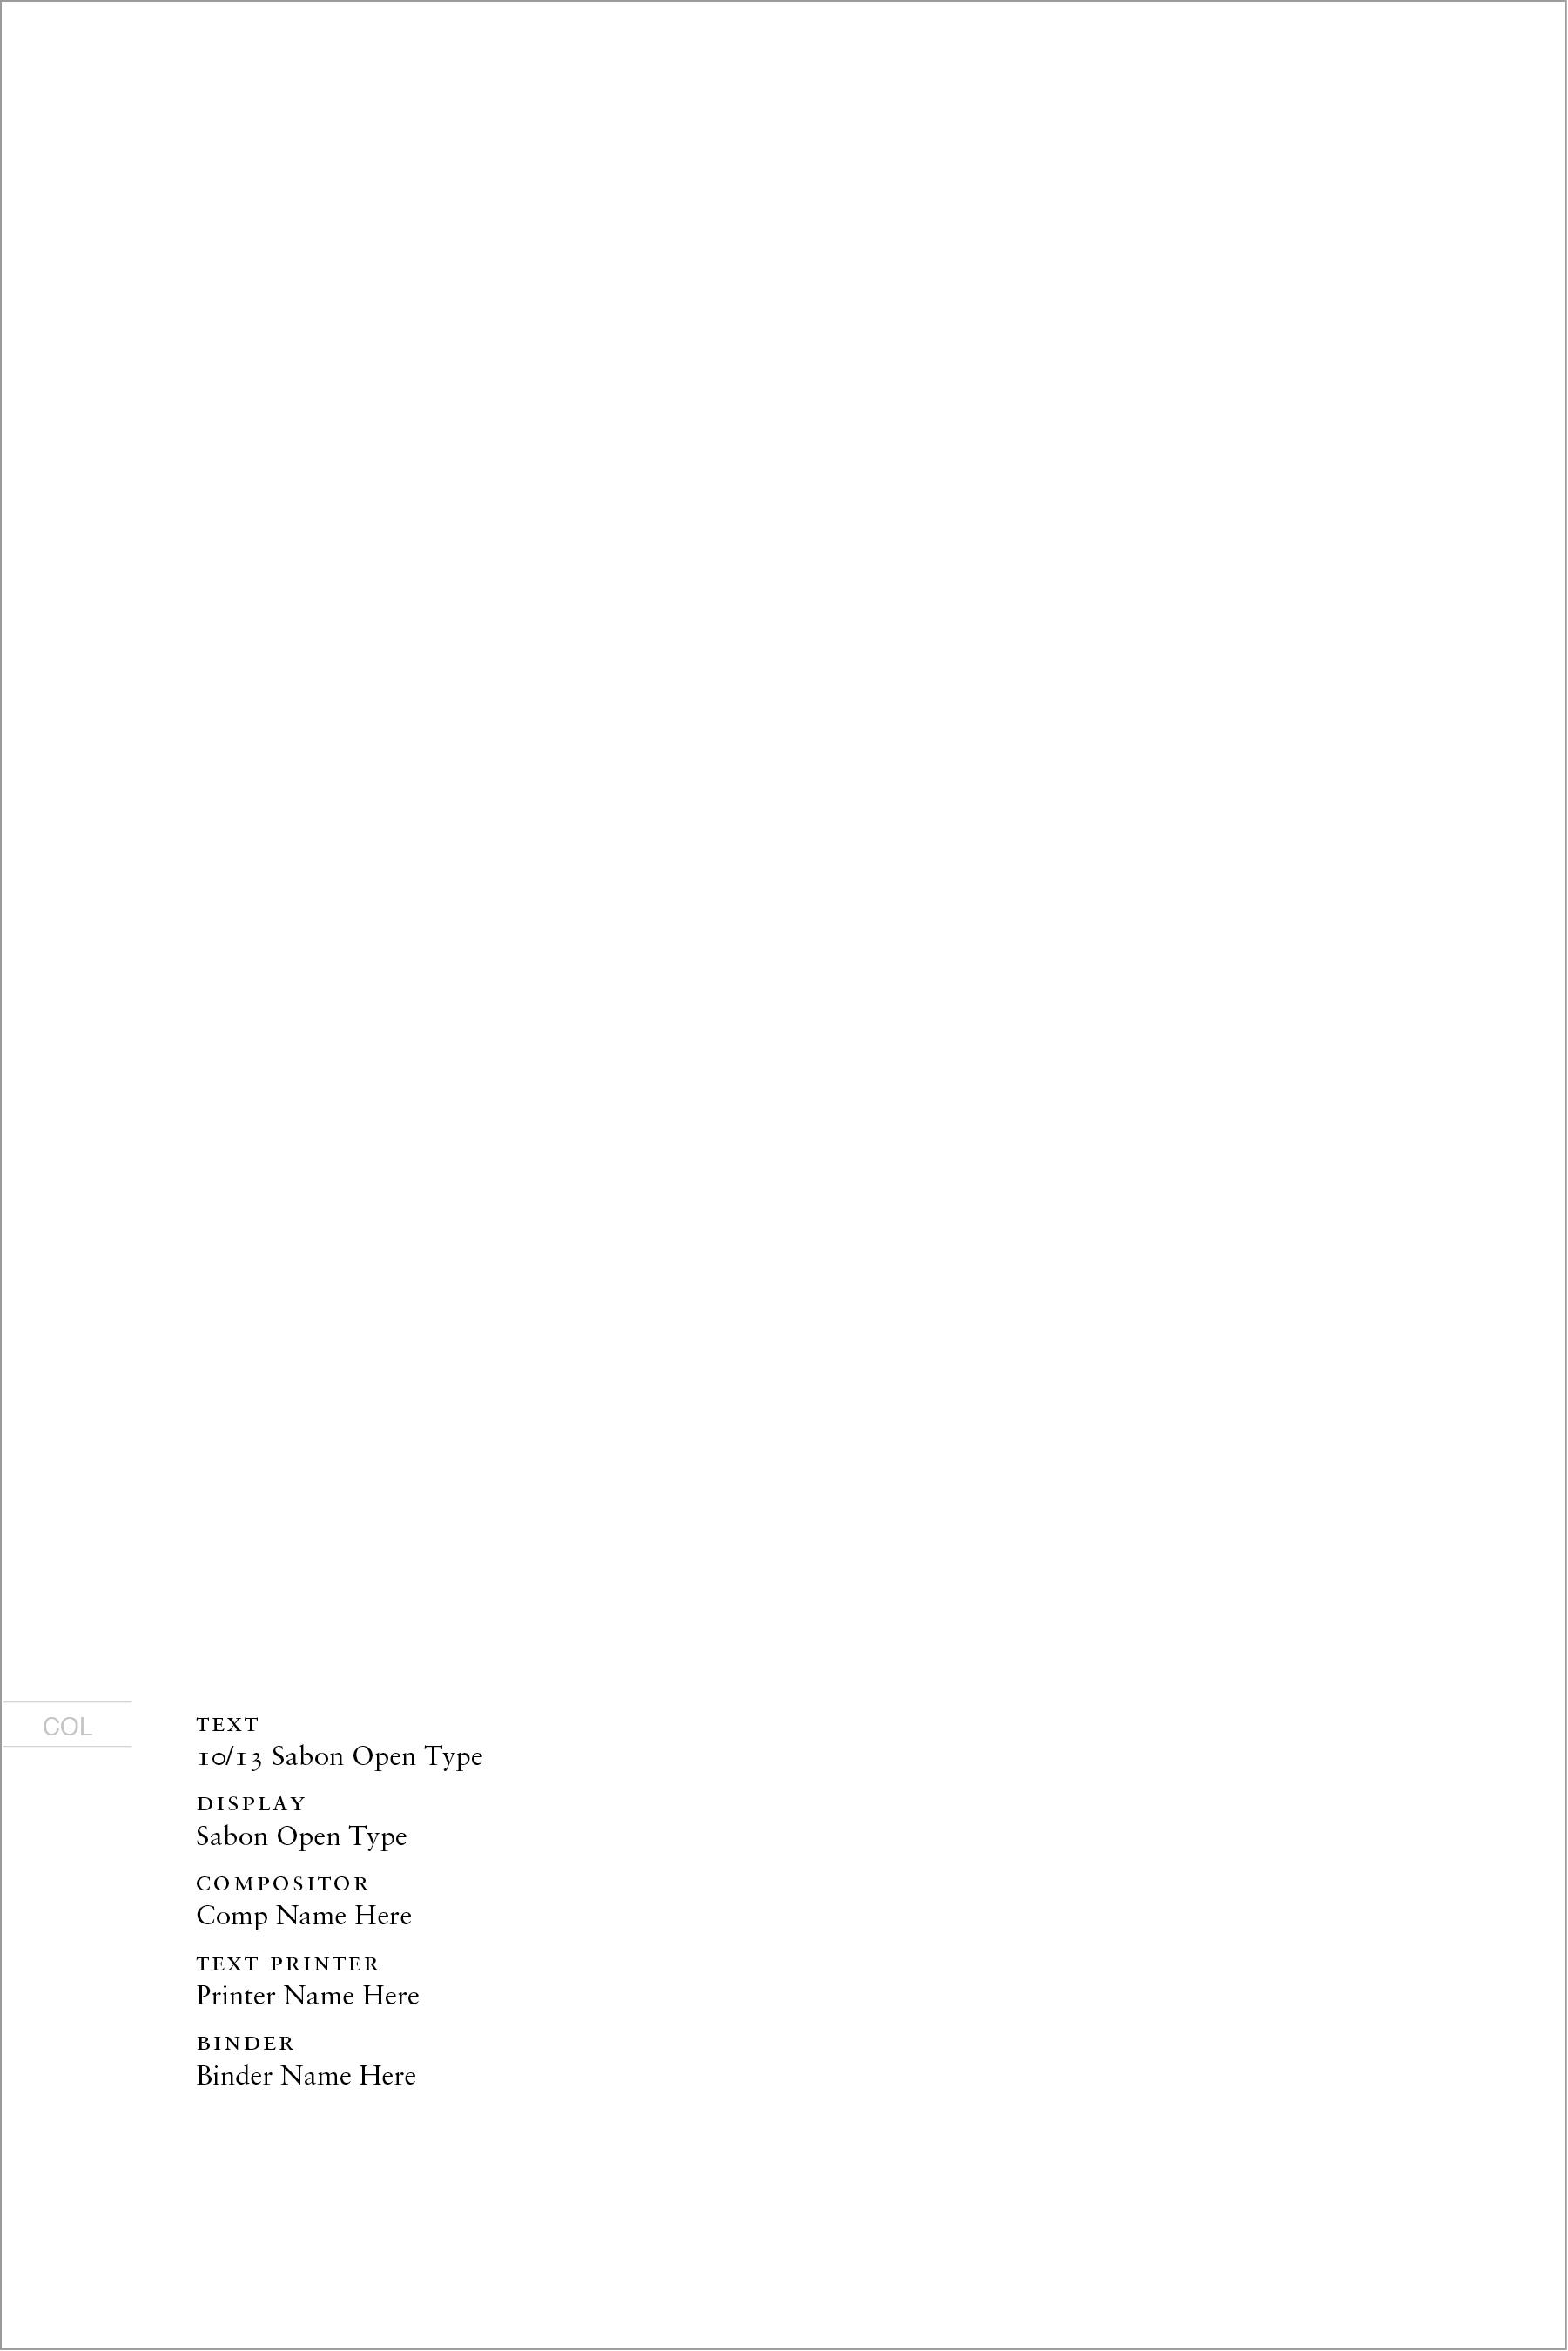 css/layouts/img/img62.jpg